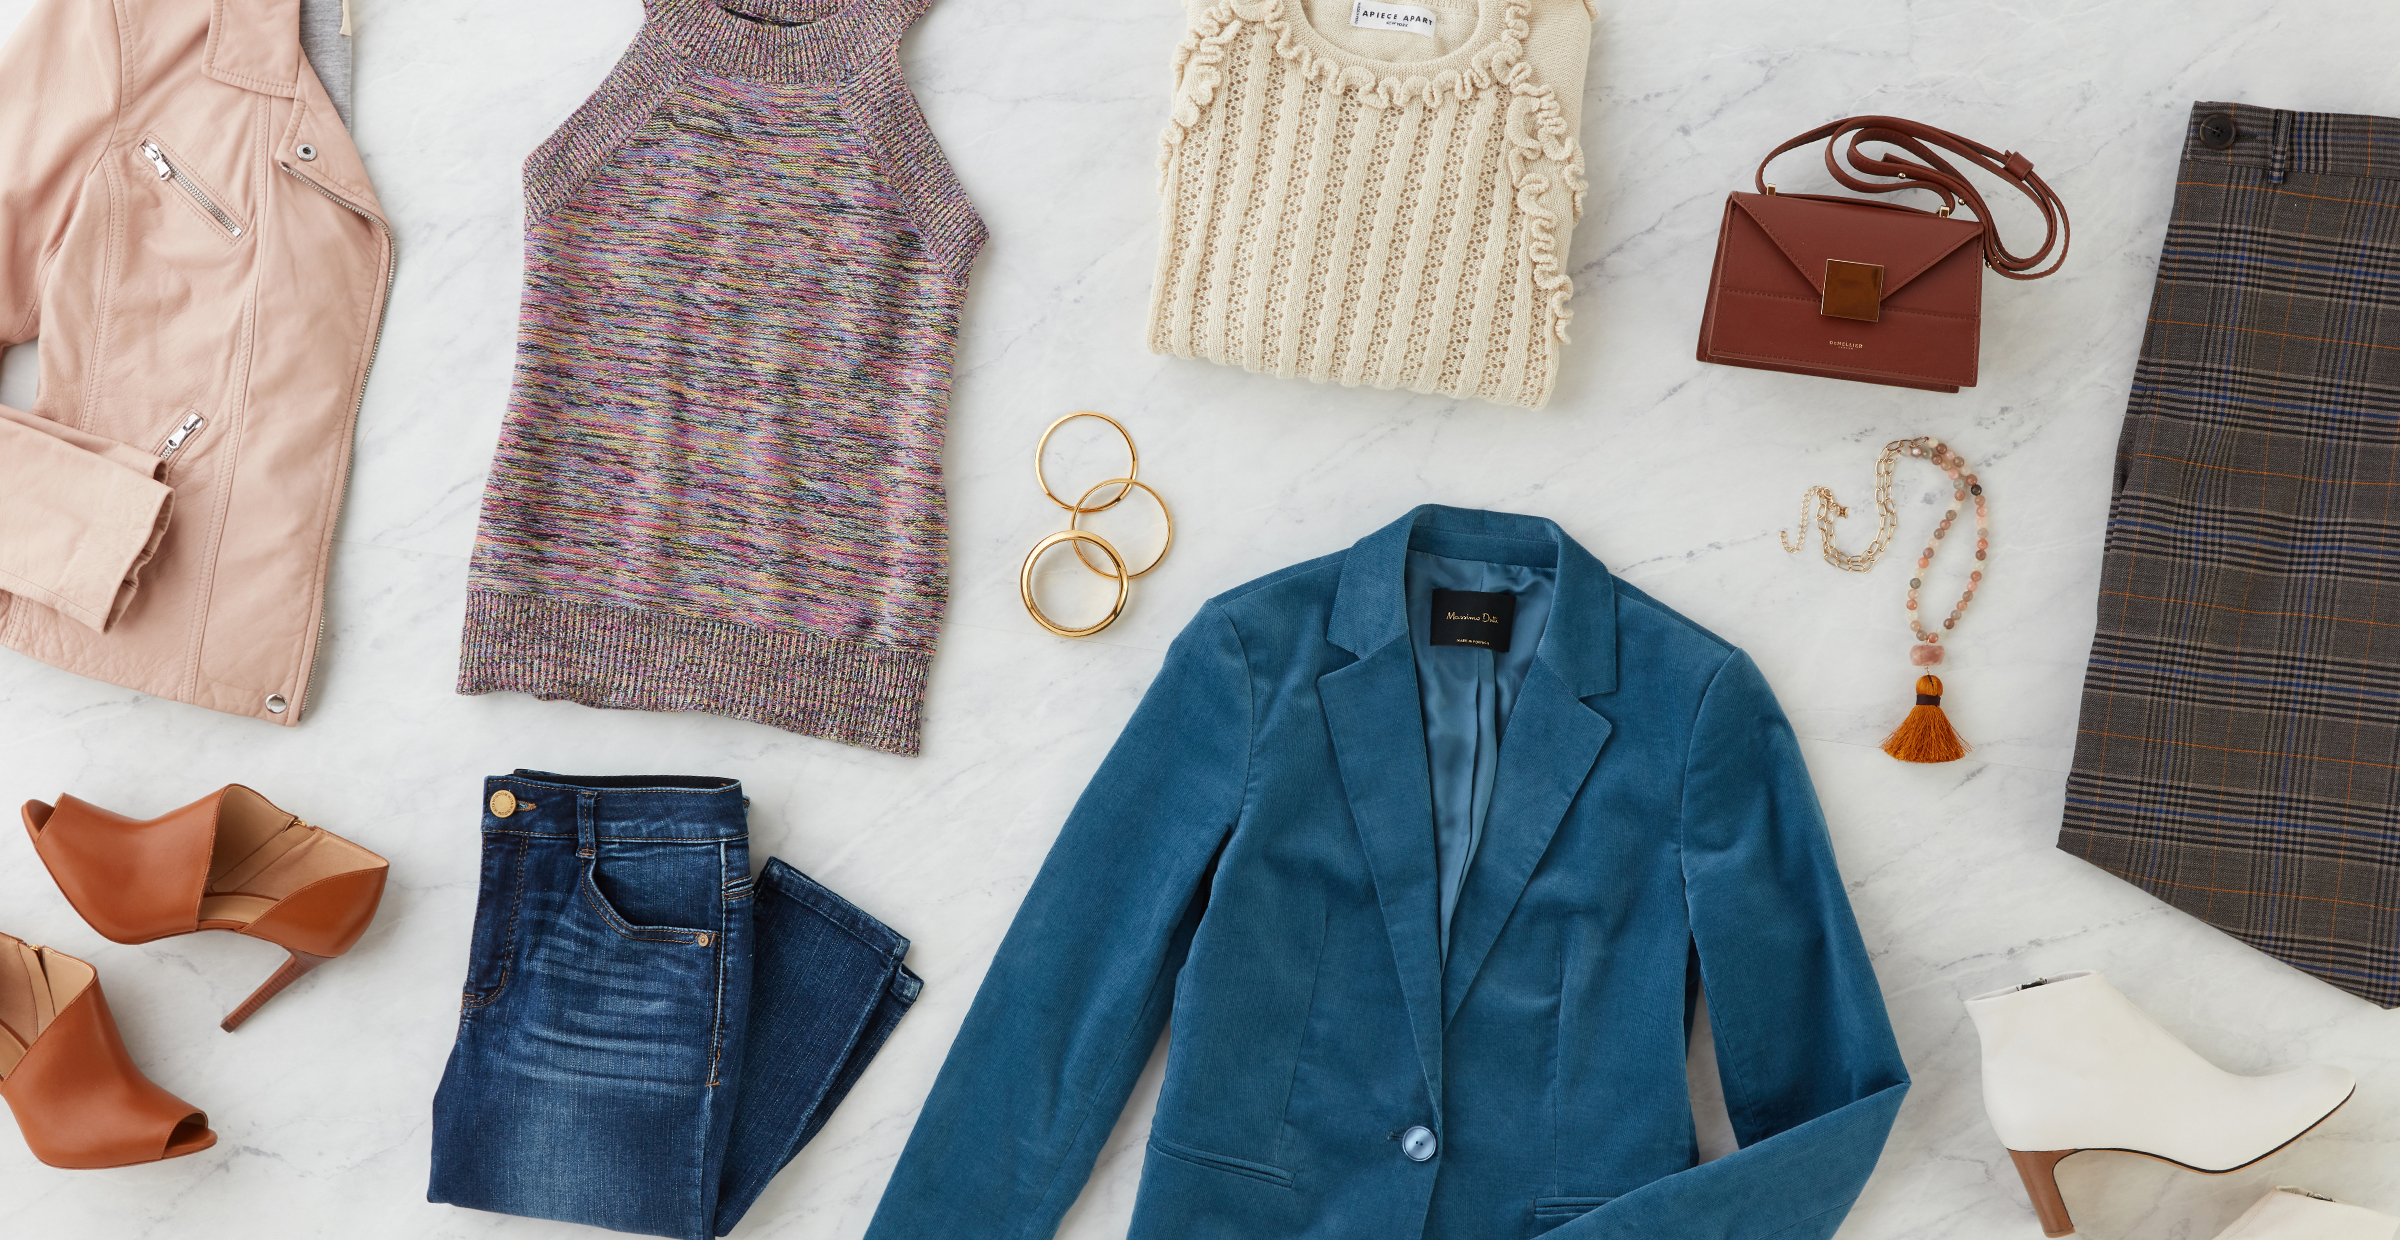 Women's fall clothing essentials